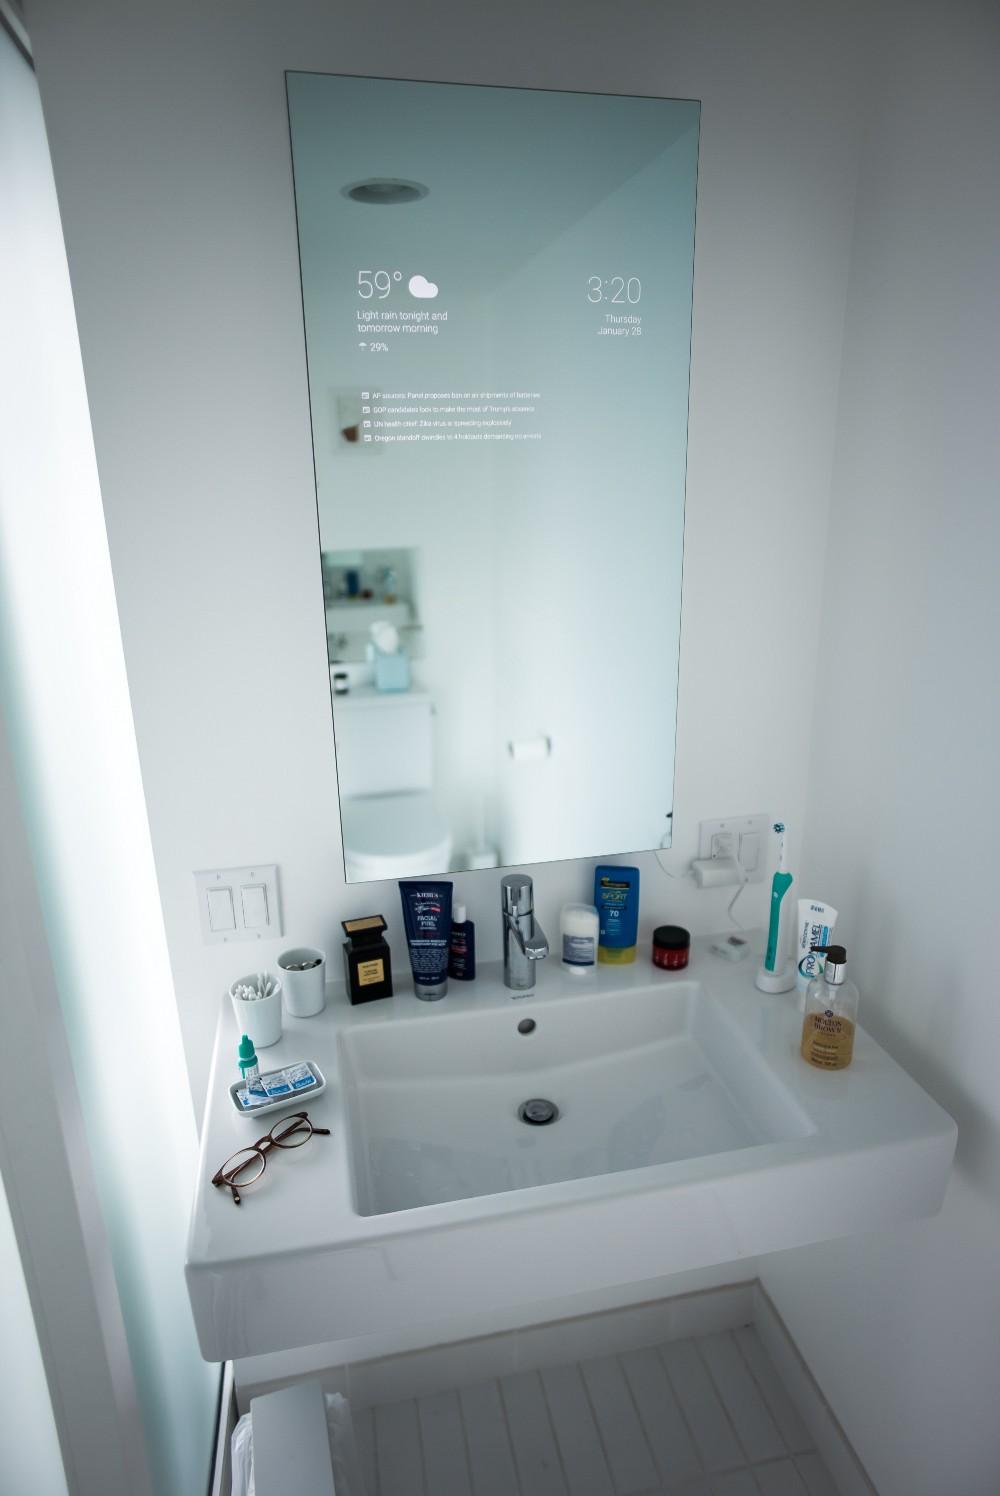 Google ingenjör bygger intelligent badrumsspegel   swedroid